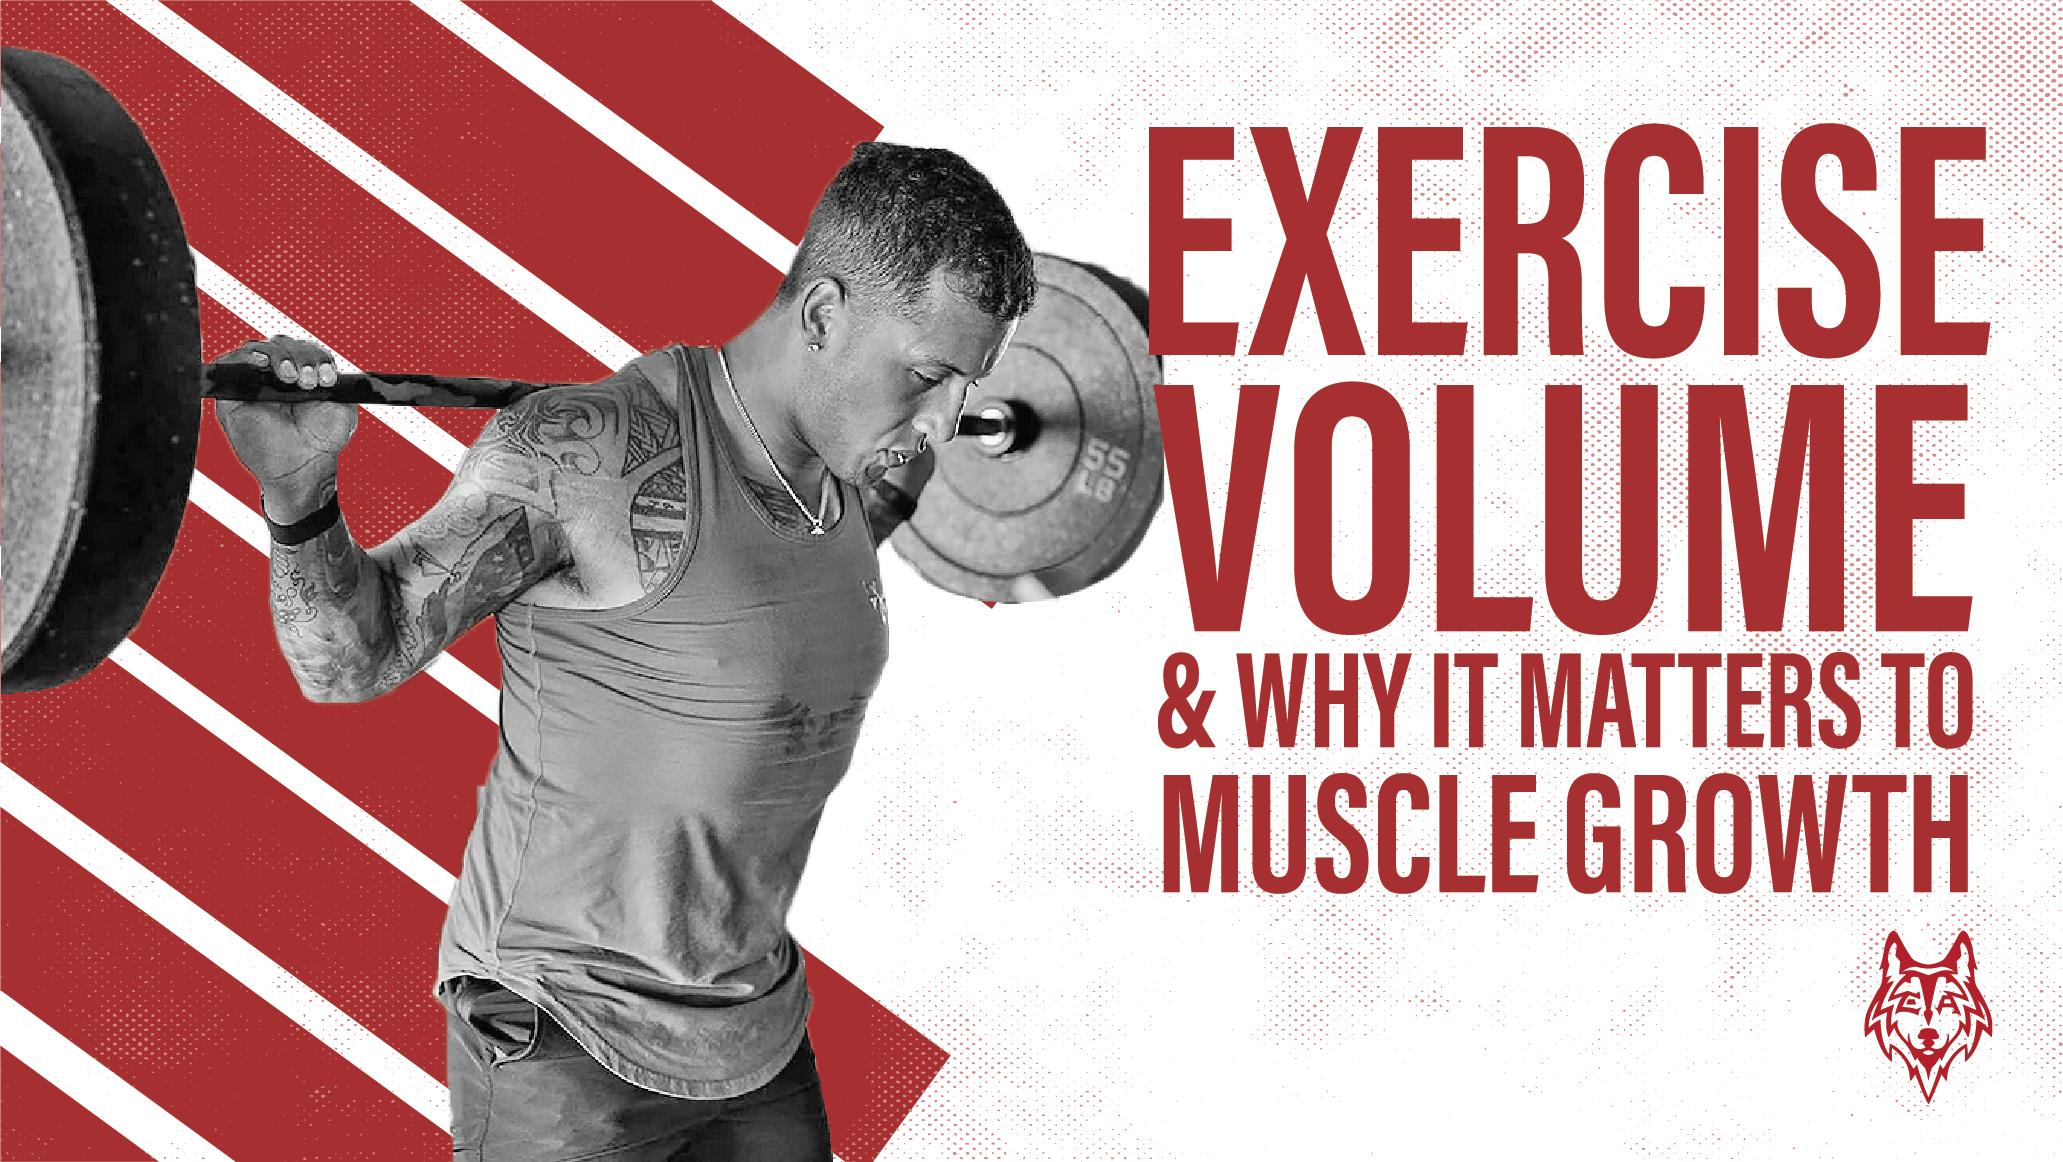 Exercise Volume